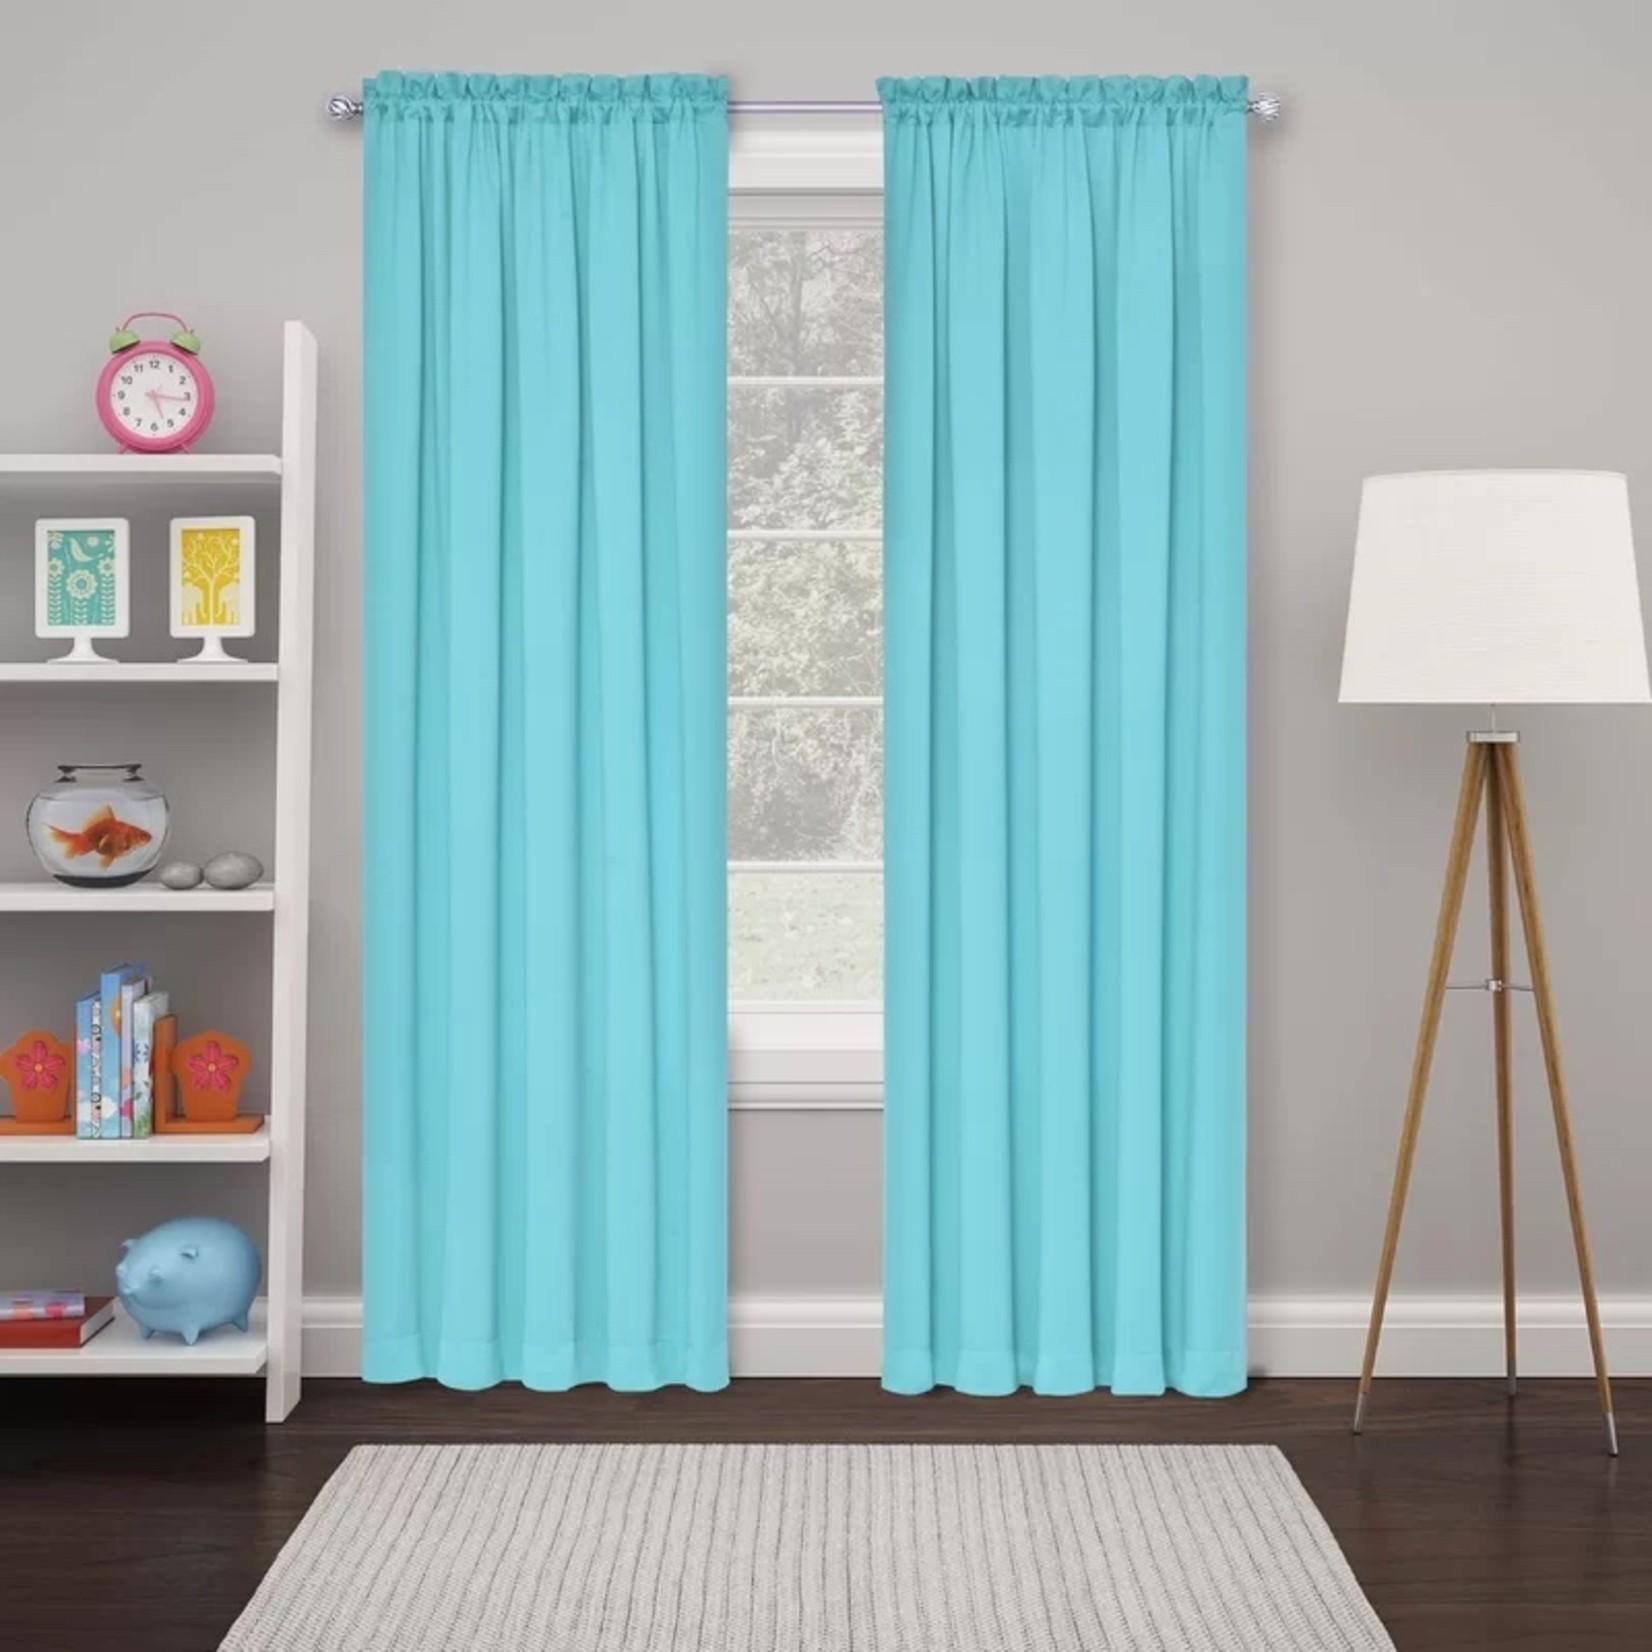 "*26"" x 84"" - Lochlan Solid Room Darkening Rod Pocket Curtain Panels - Turquoise - Set of 2"